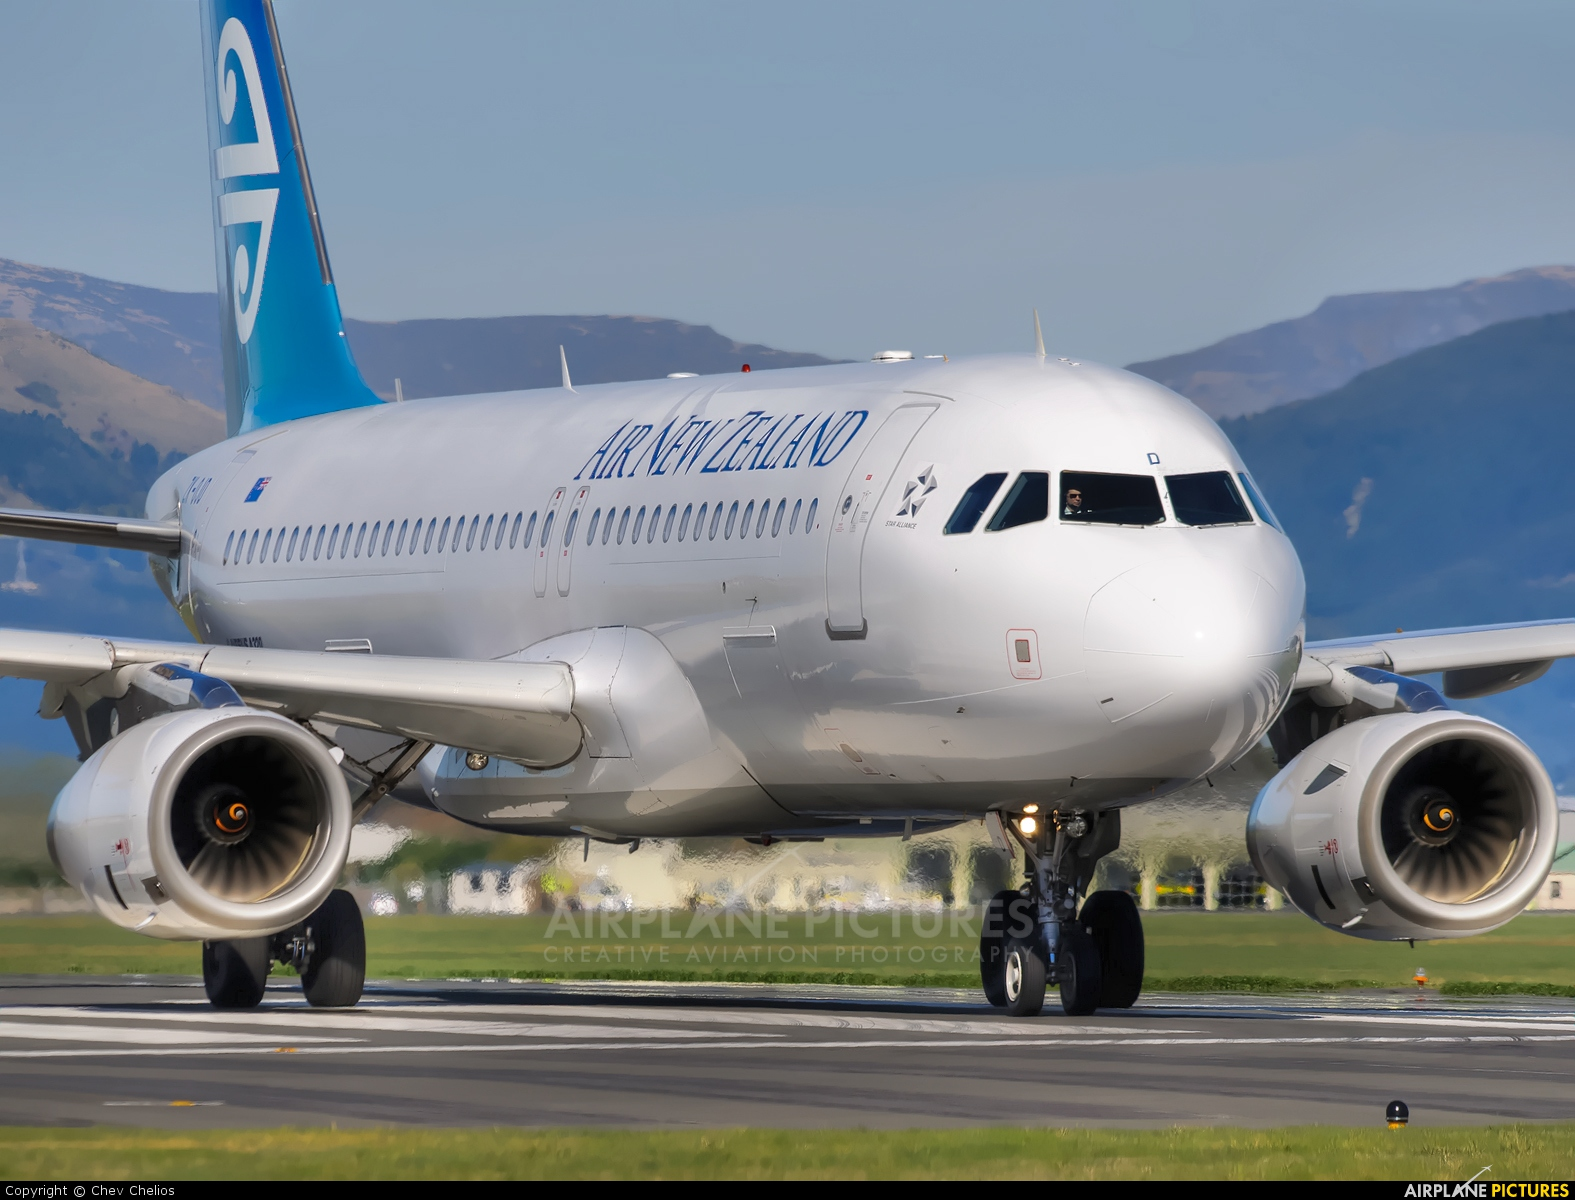 Air New Zealand ZK-OJD aircraft at Christchurch Intl